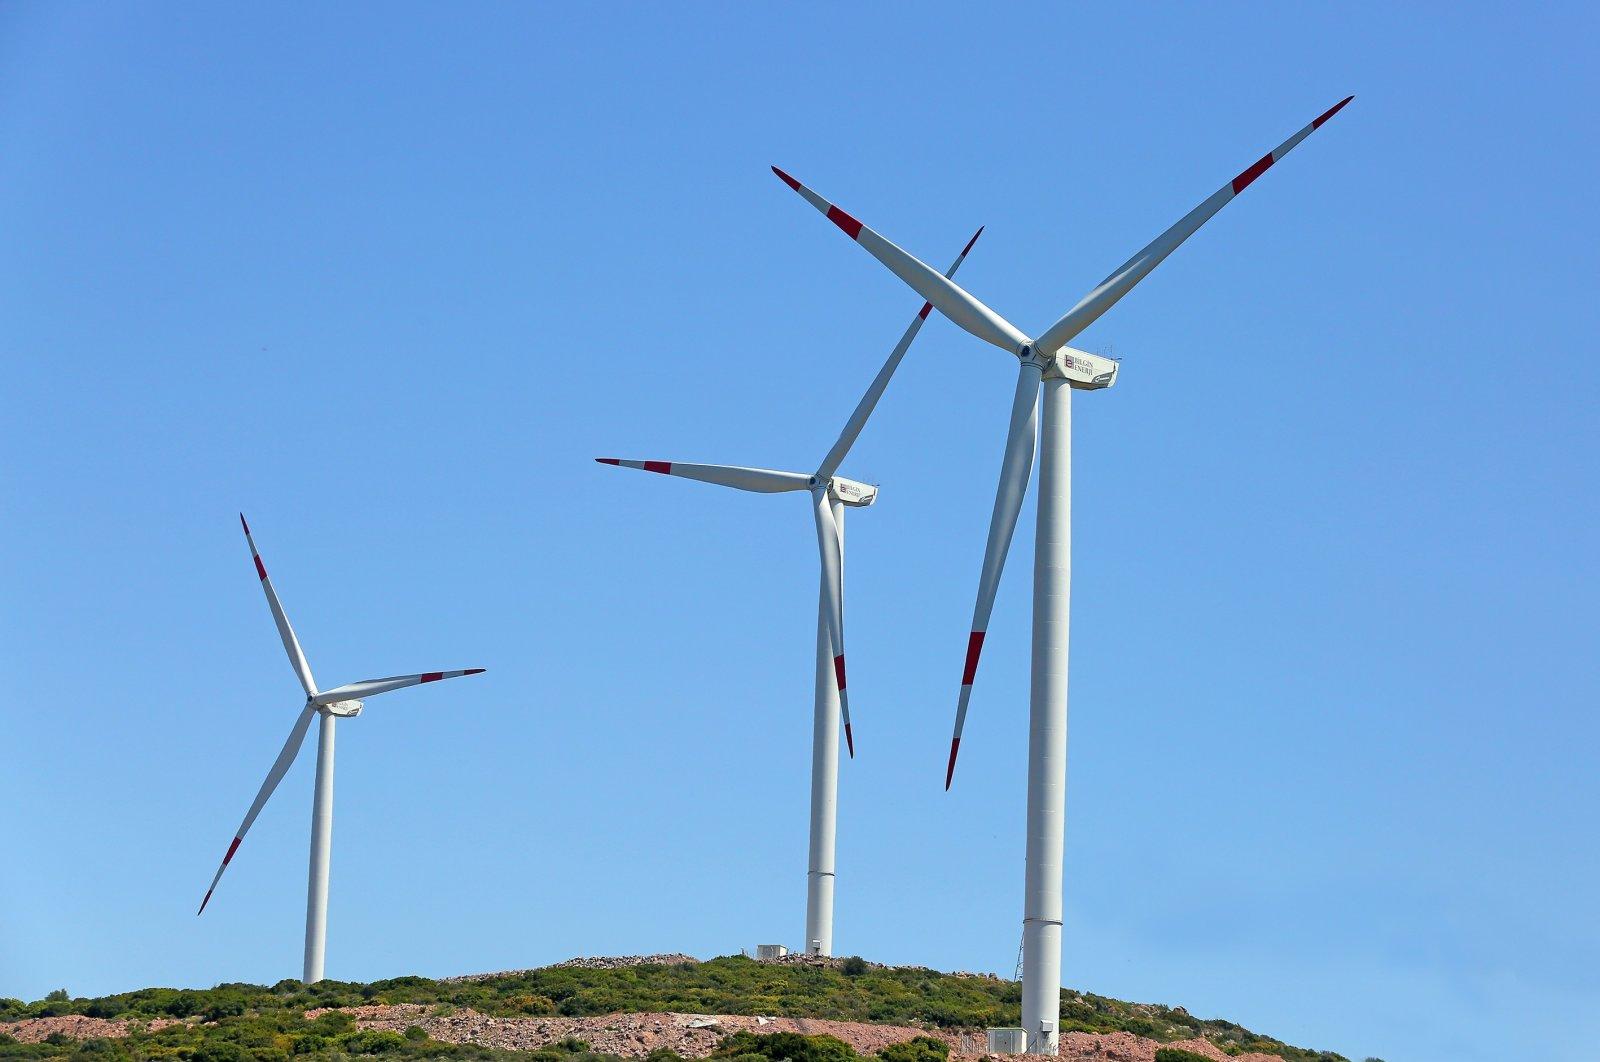 Wind turbines are seen in Turkey's western province of Izmir, Aug. 17, 2020. (IHA)